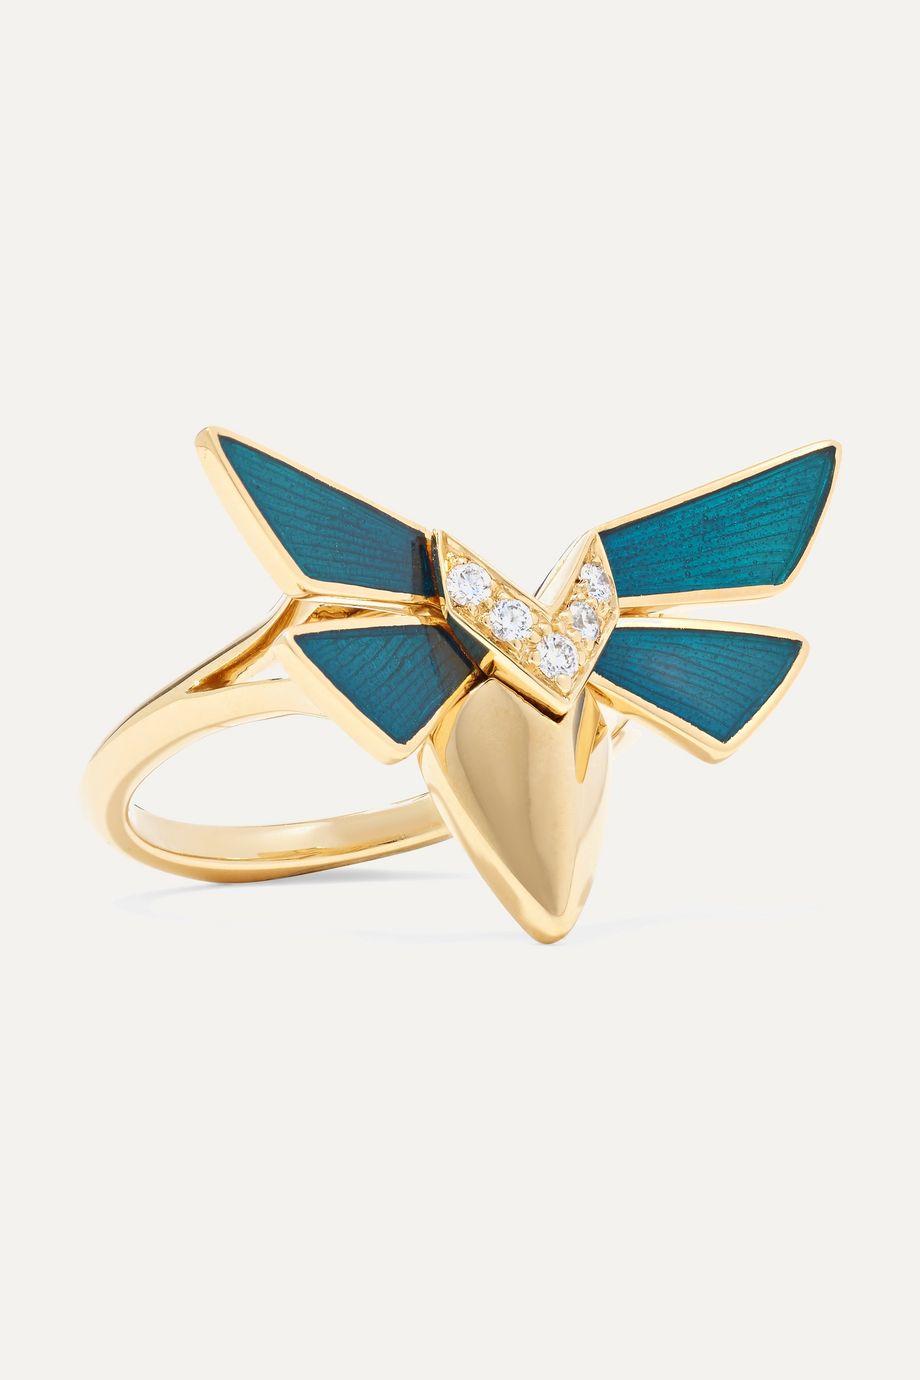 Stephen Webster Jitterbug 18-karat gold, diamond and enamel ring